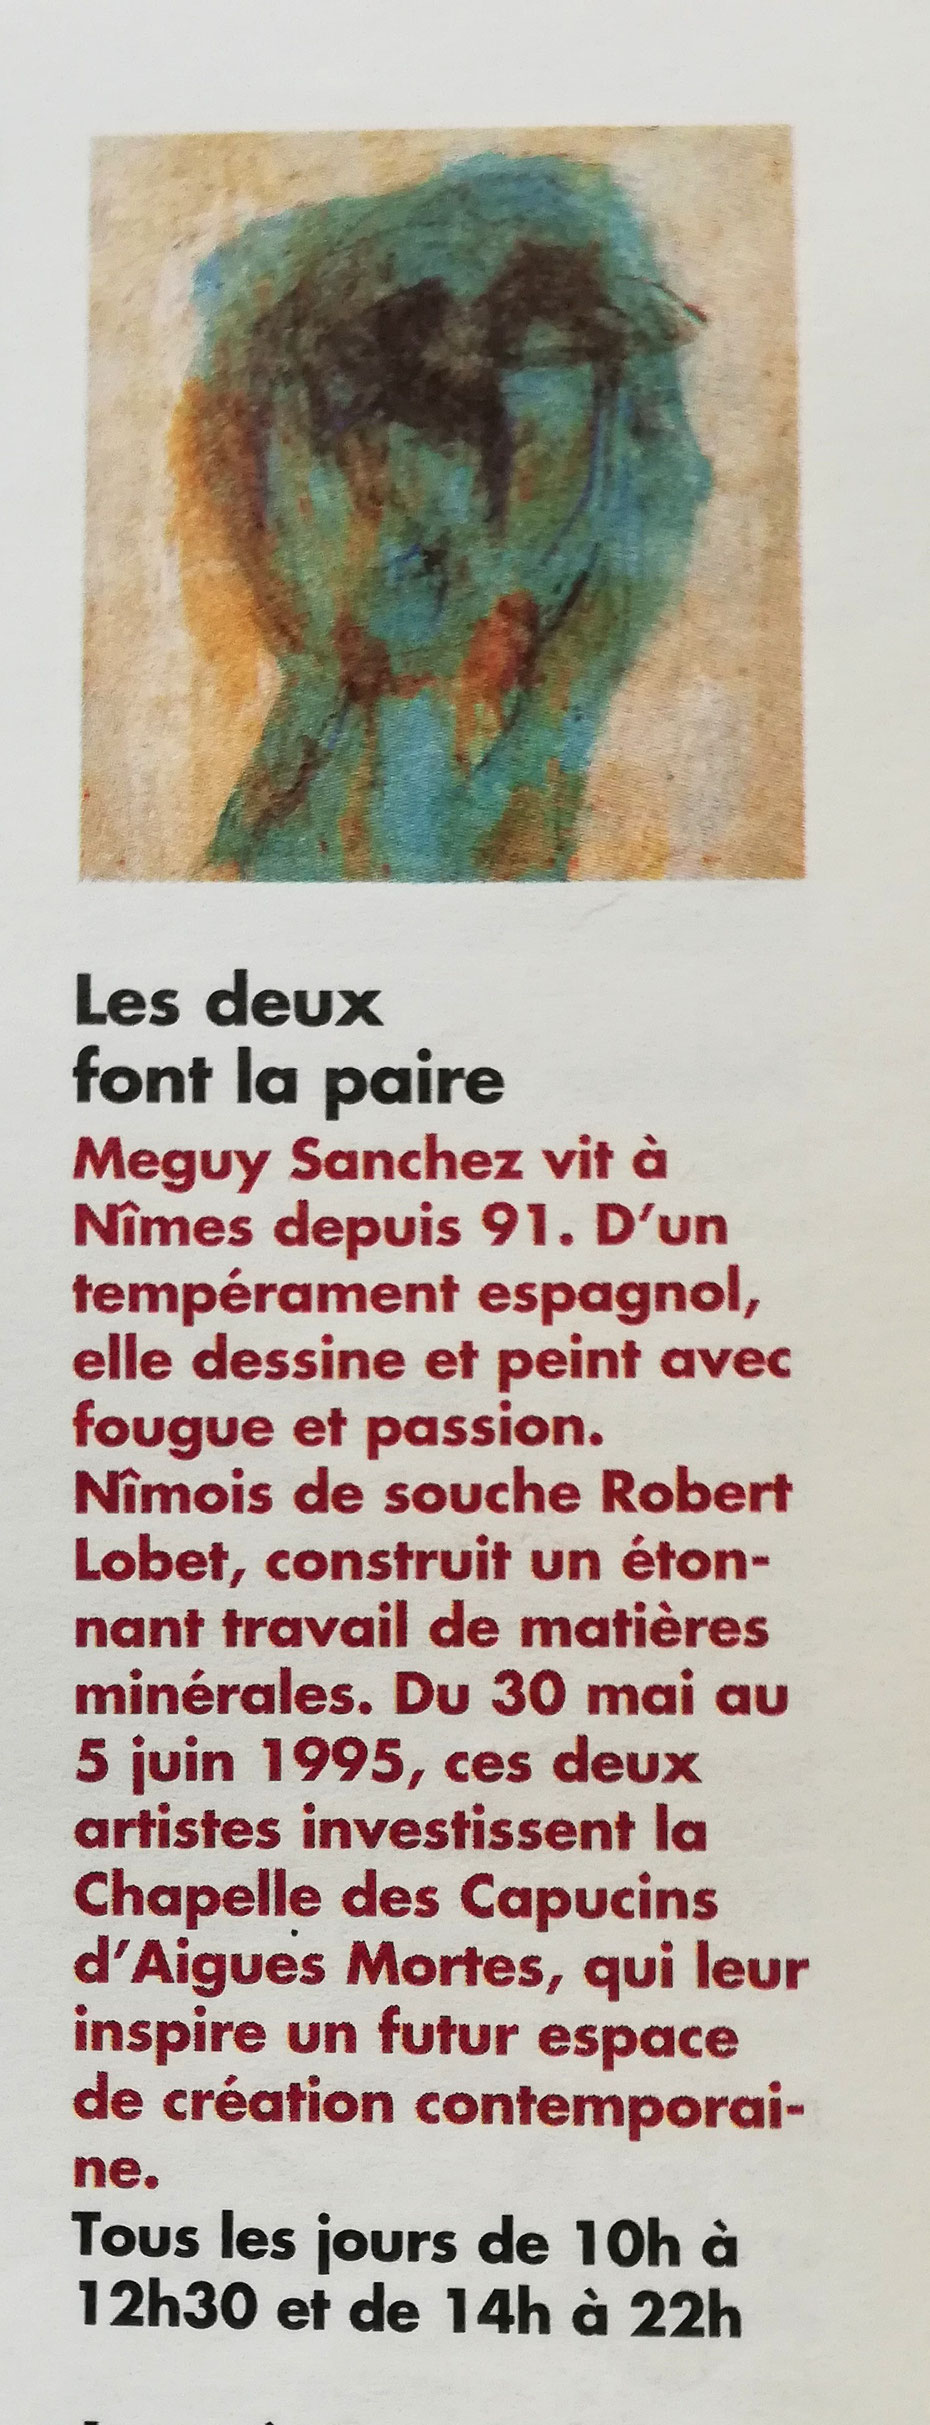 Ville de Nîmes mai 1995 numéro : 23